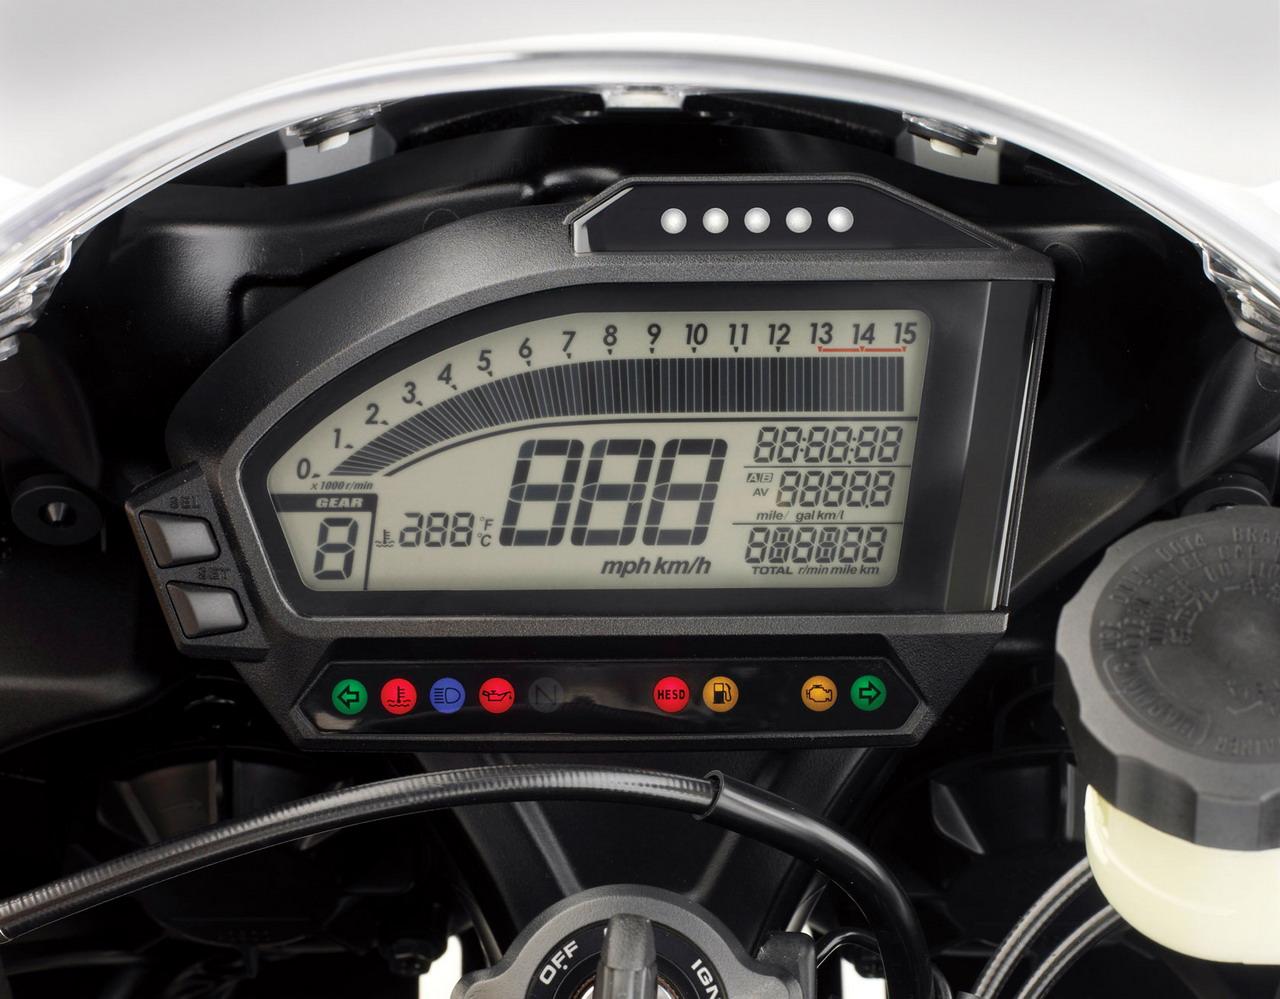 2012 honda cbr 1000rr tachometer